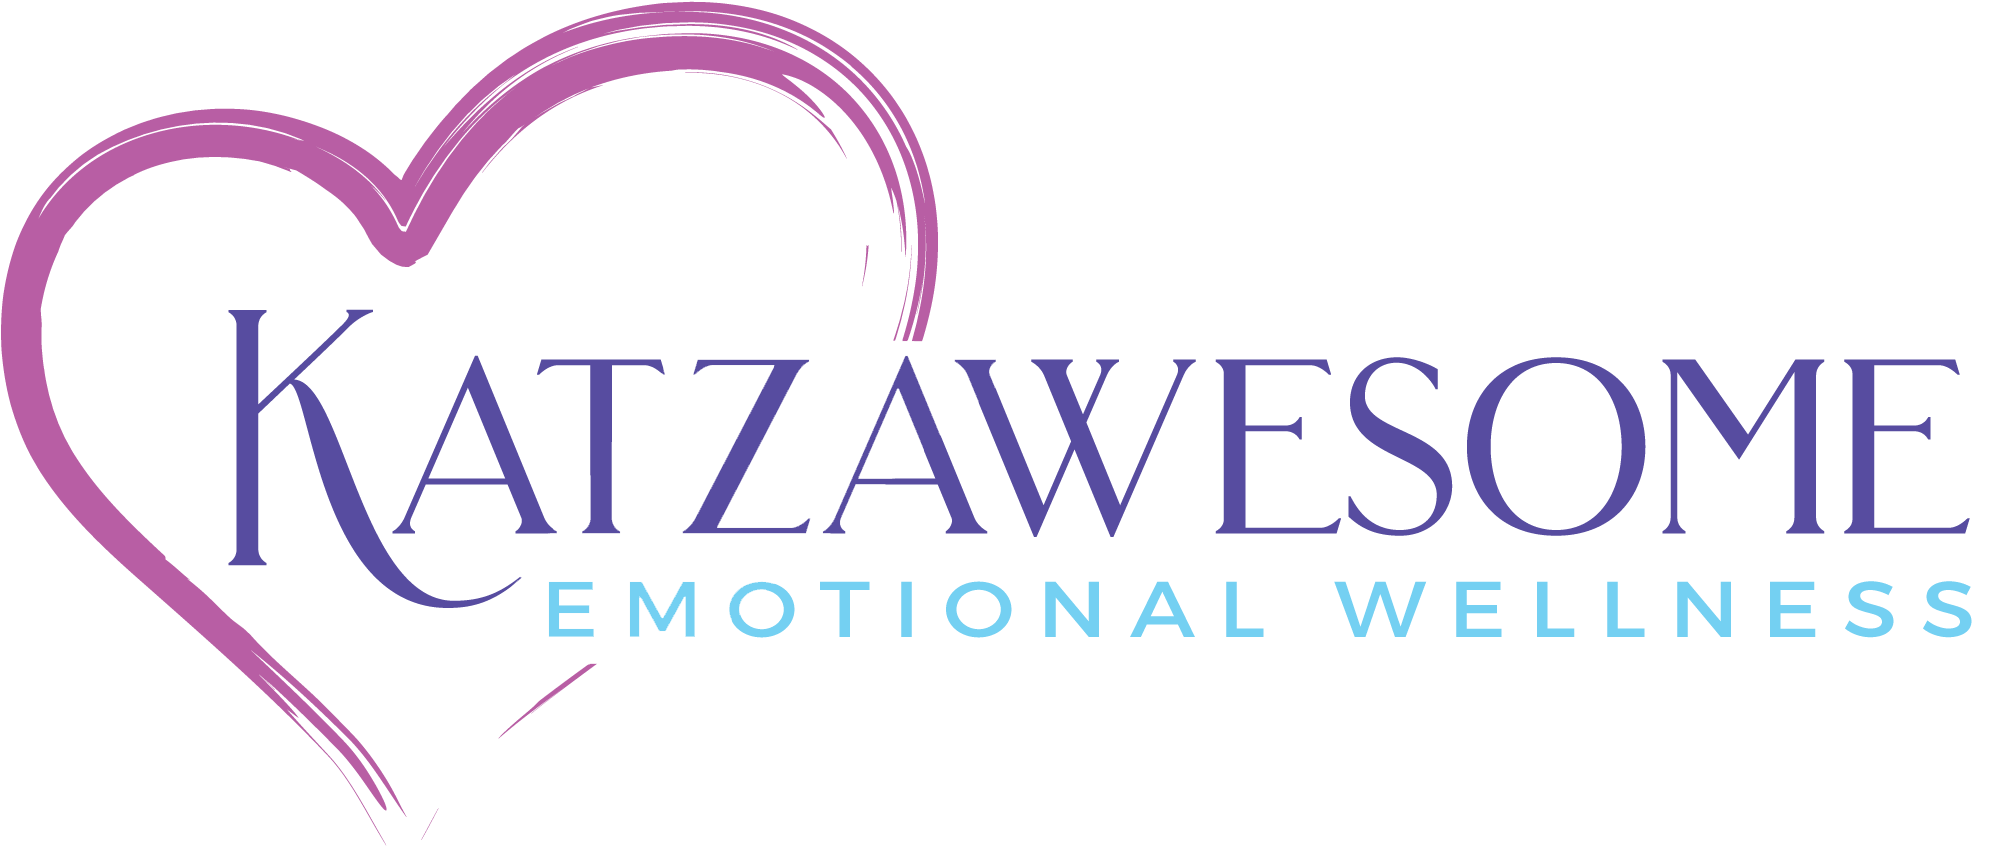 Katzawesome Emotional Wellness